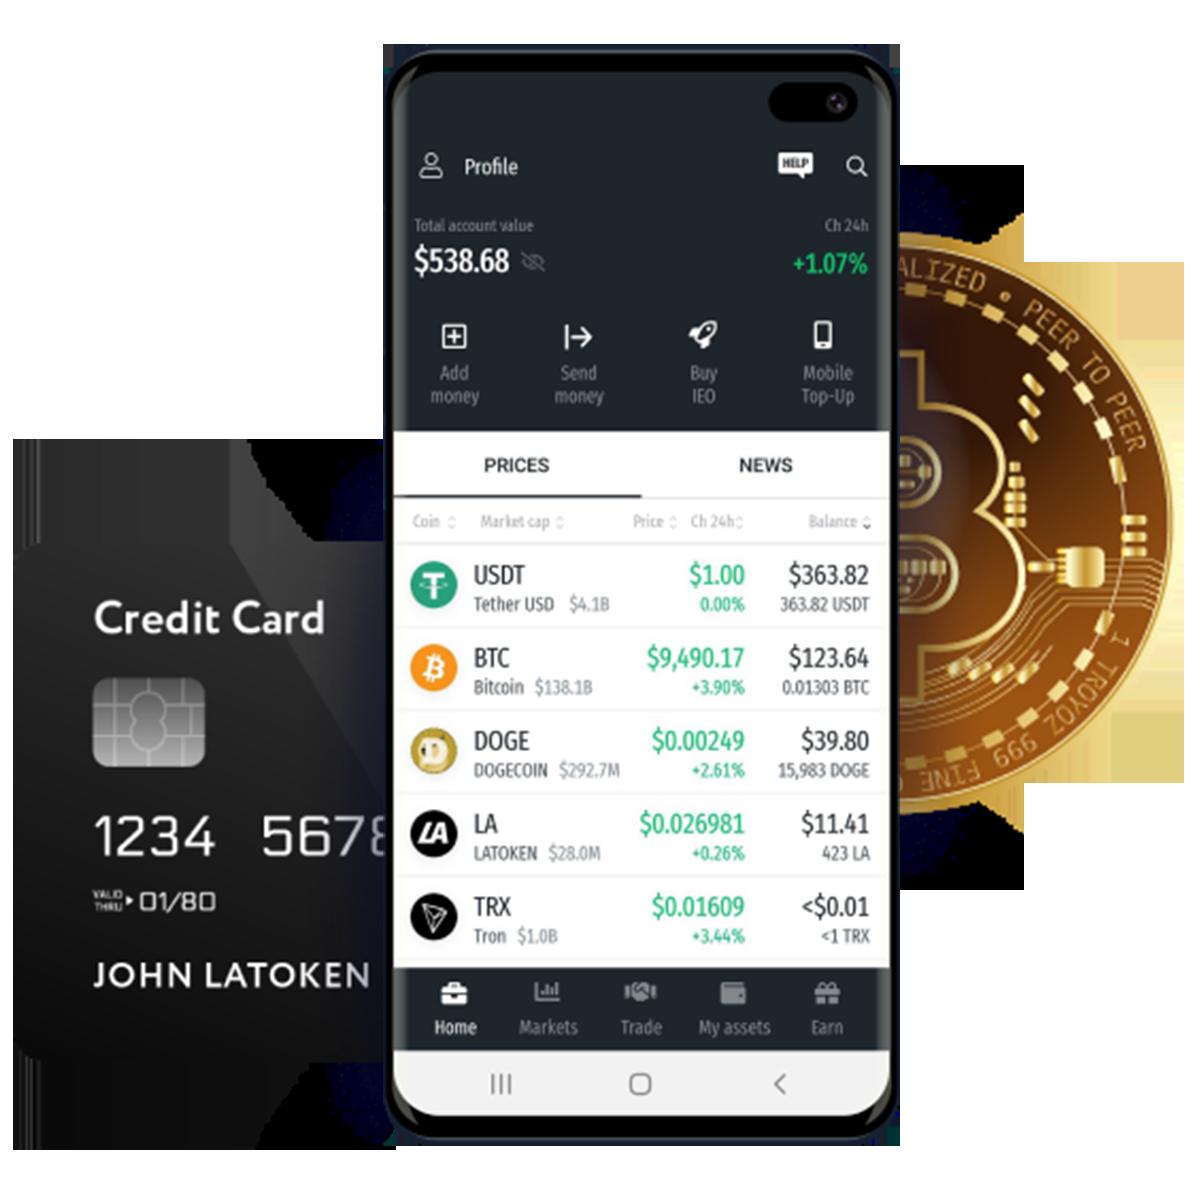 Latoken Cryptocurrency Exchange App